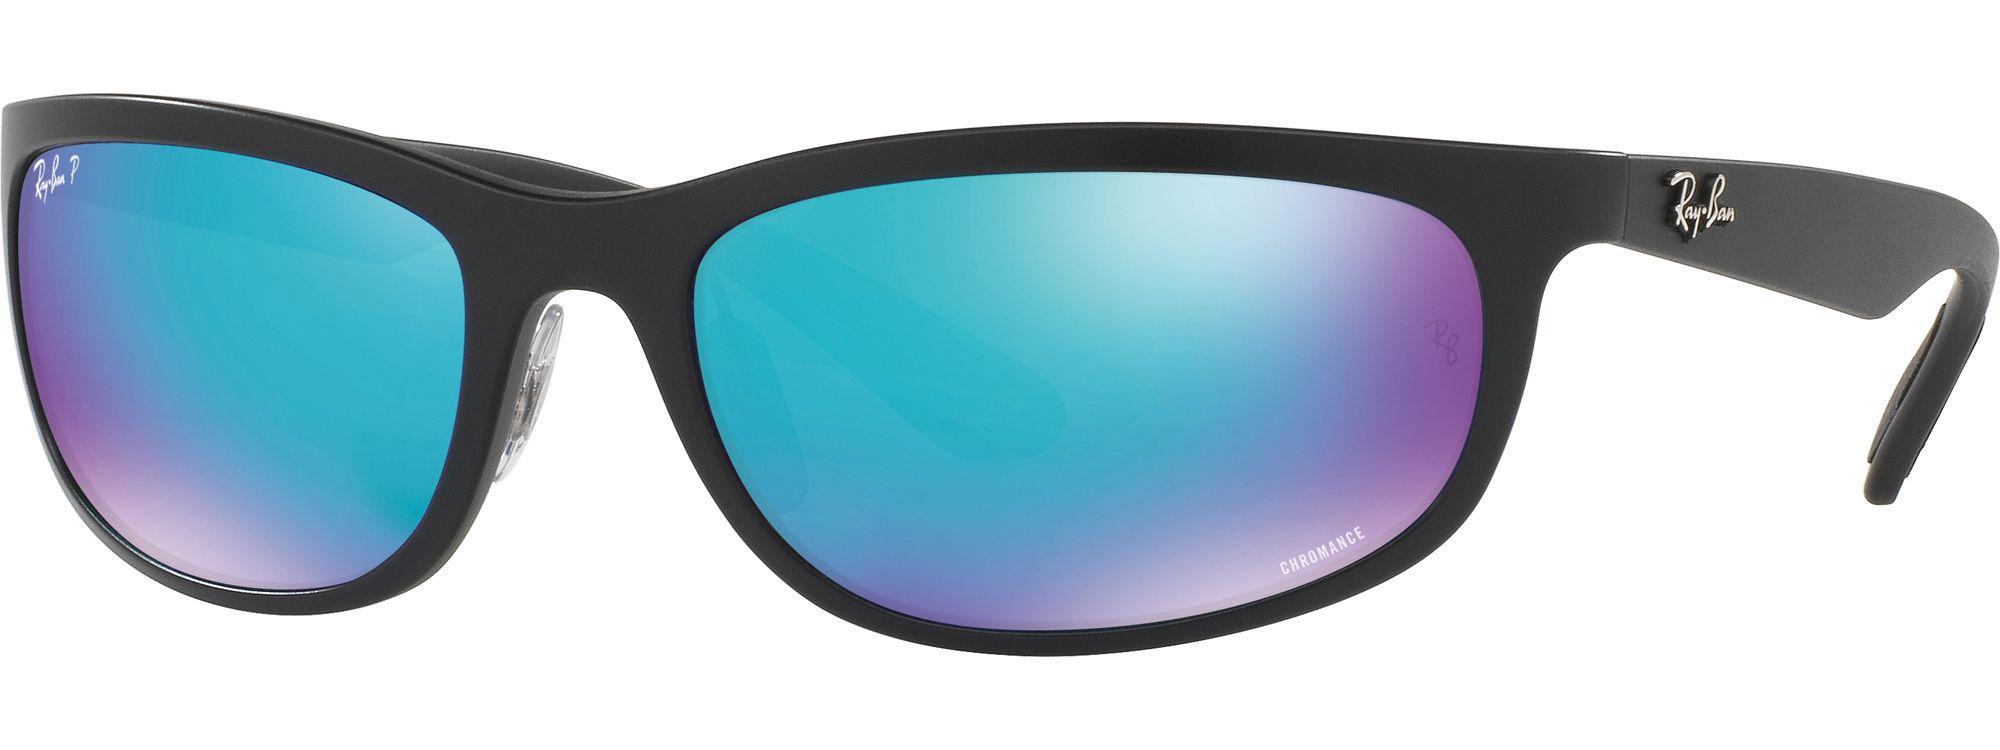 31bc2e249d Ray-Ban - Blue Rb4265 Chromance Polarized Sunglasses for Men - Lyst. View  fullscreen